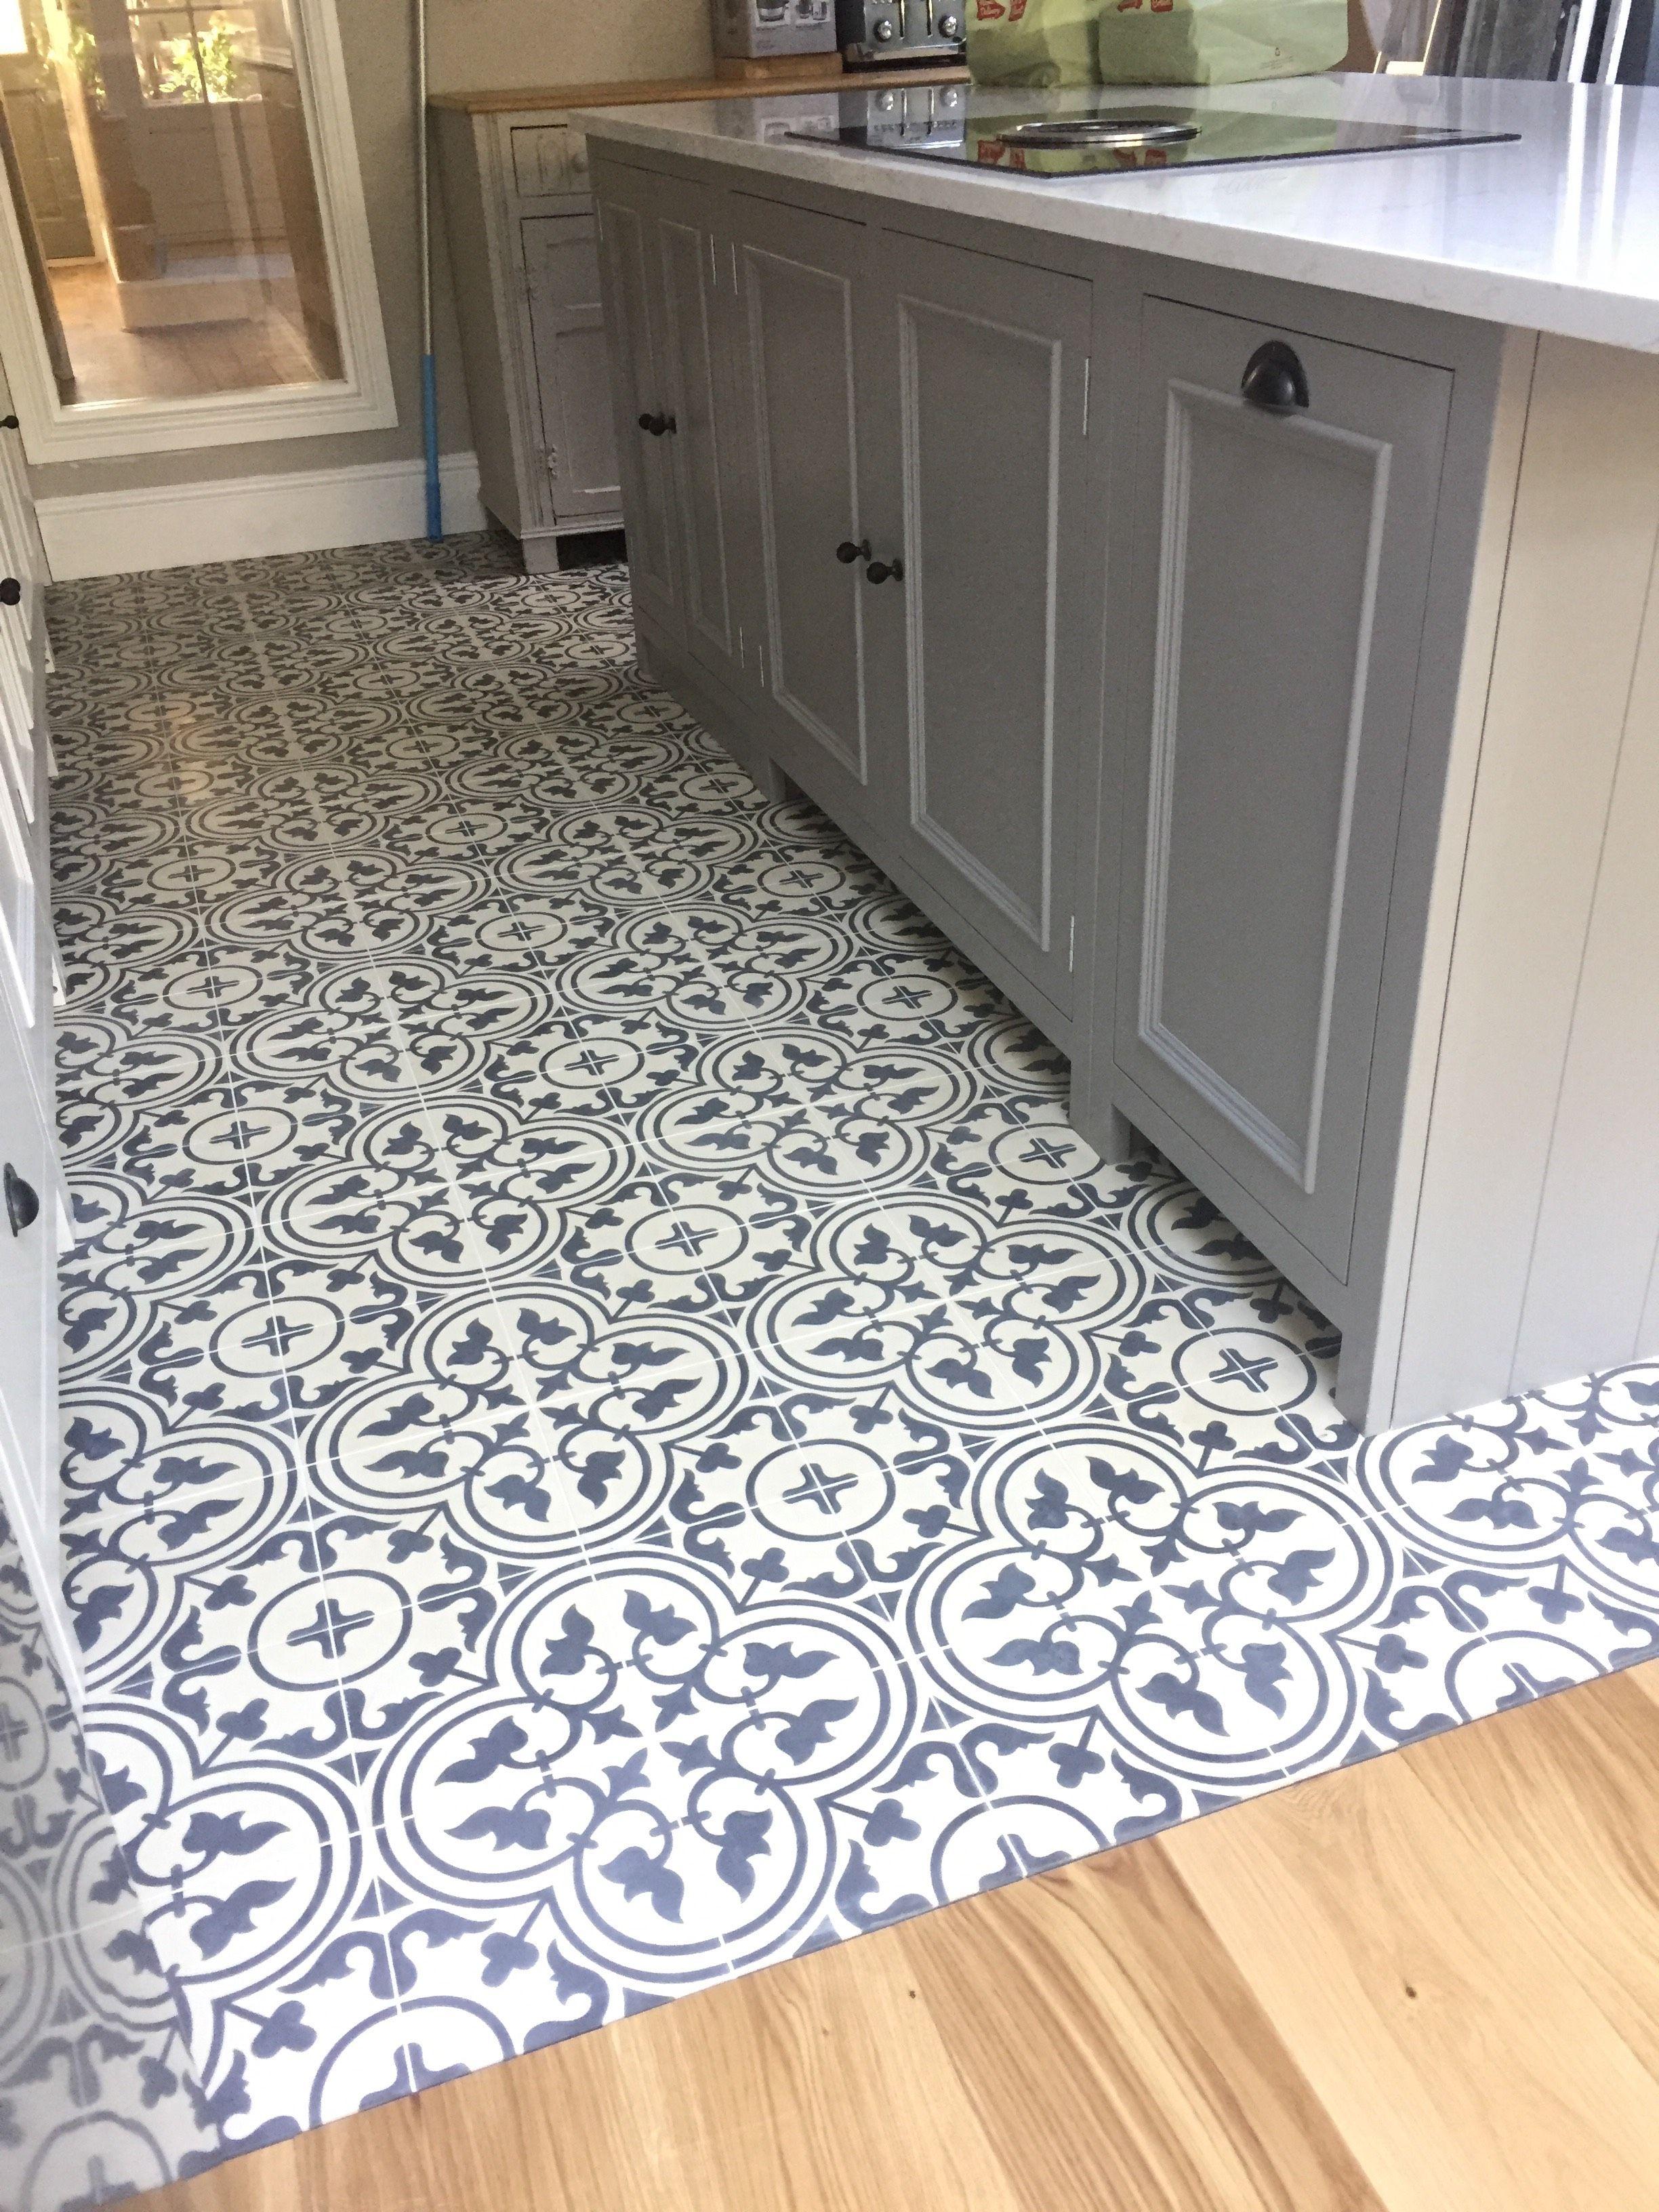 Barcelona 282 On A Kitchen Floor Very Stylish Encaustic Tiles